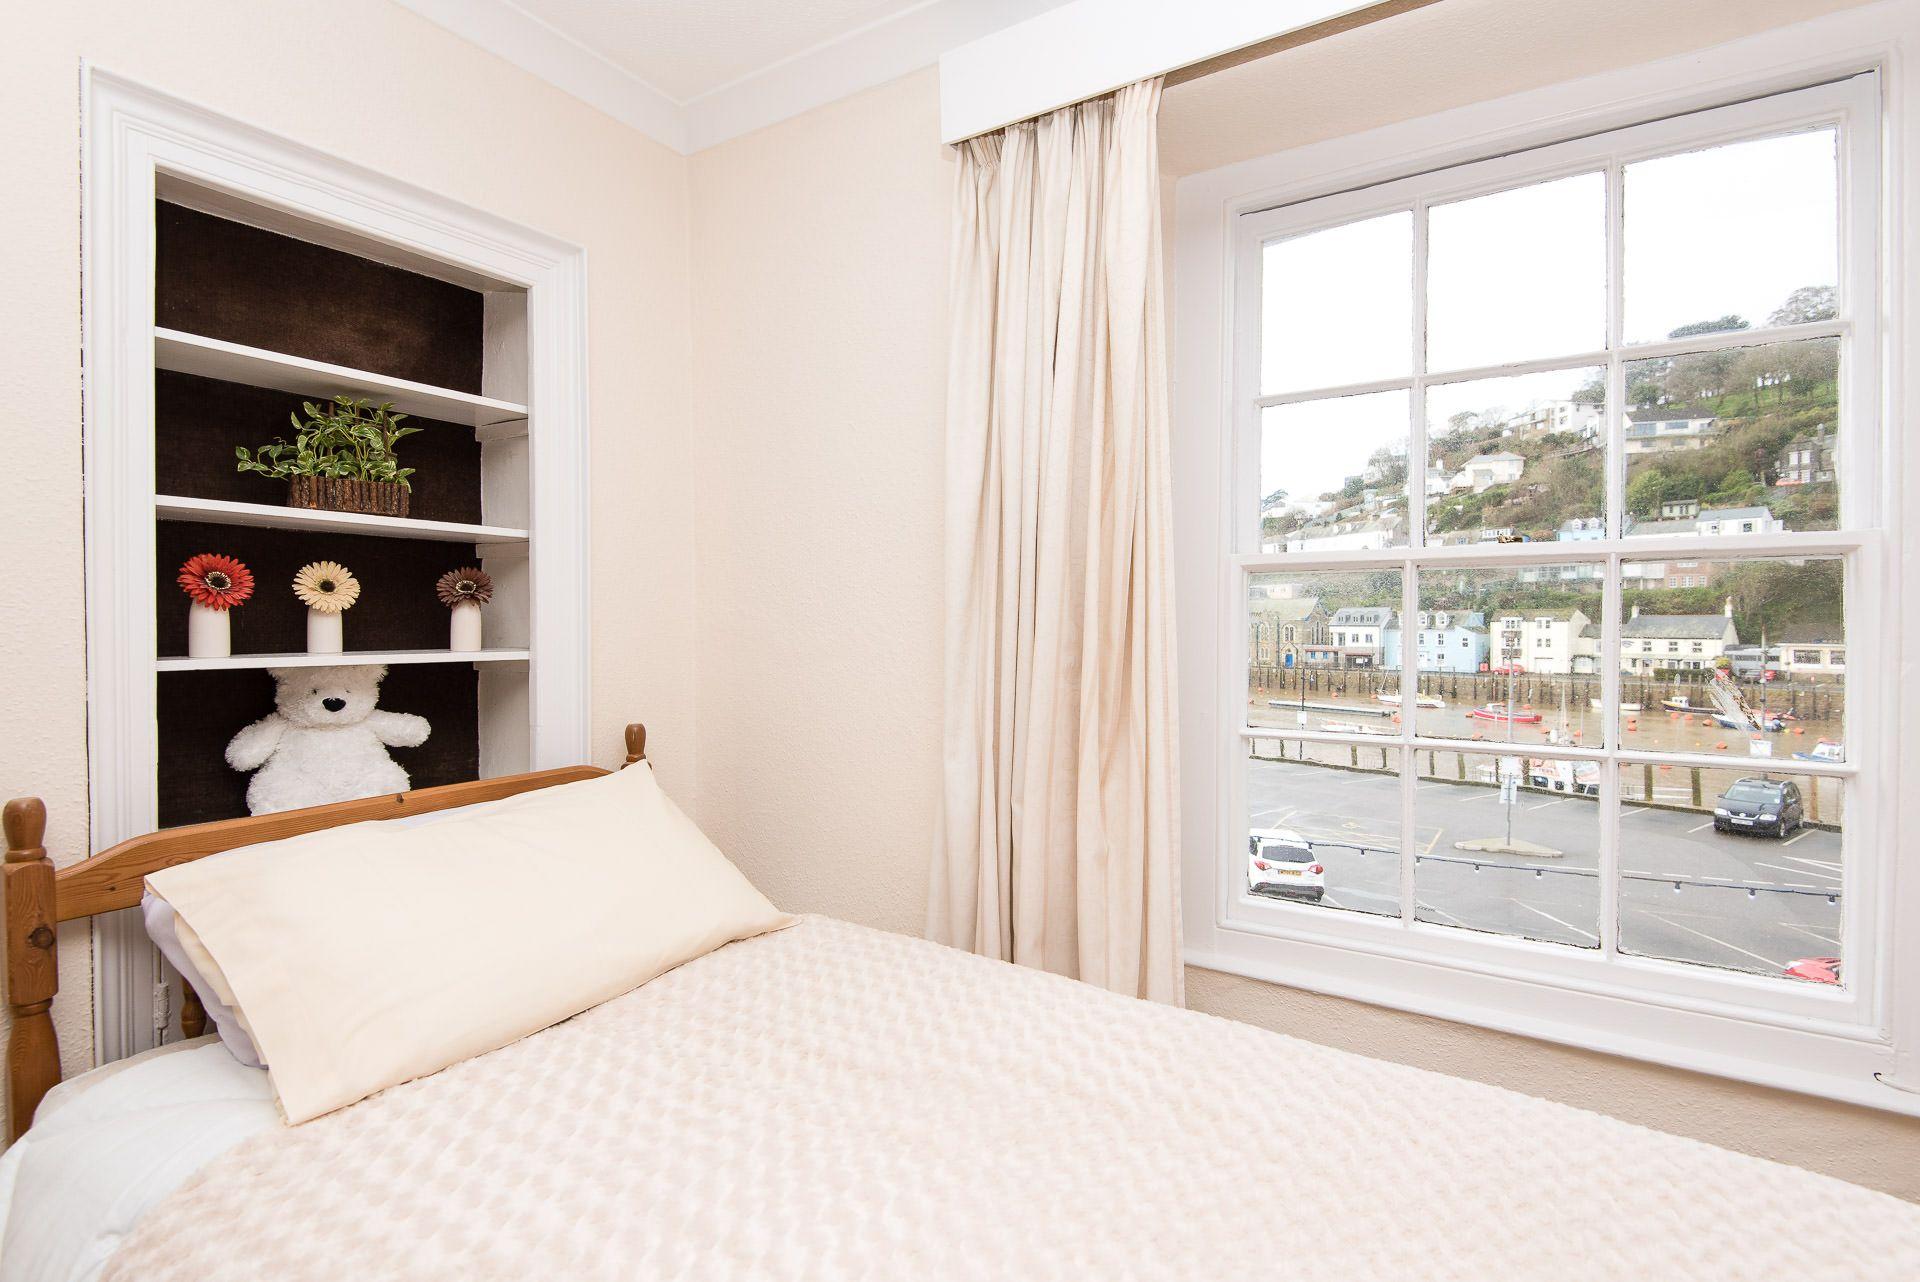 Quayview Apartment in Looe master bedroom window view